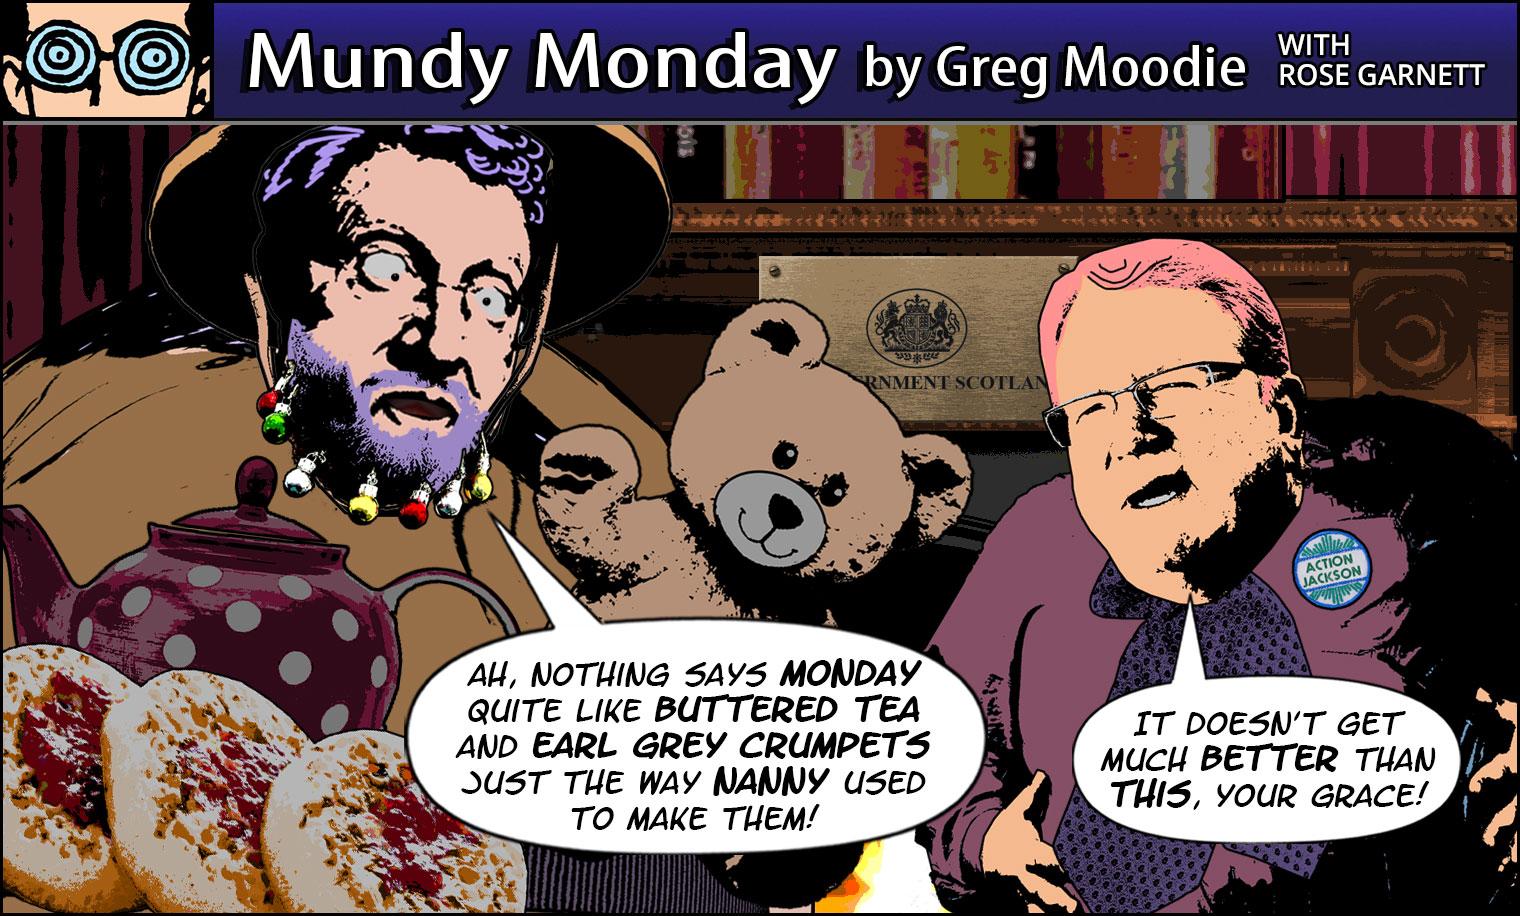 Mundy Monday